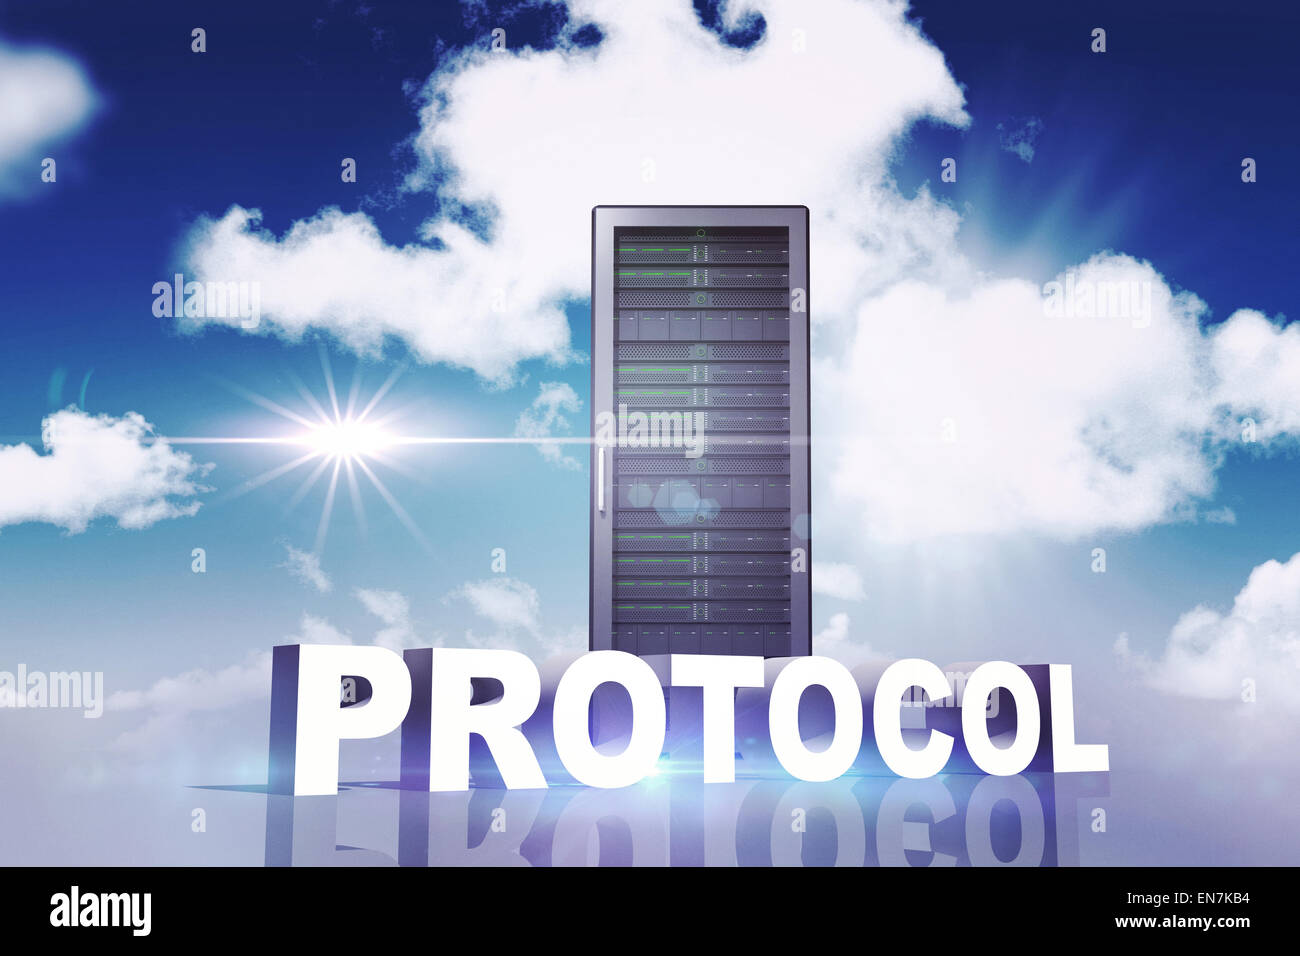 Composite image of protocol - Stock Image